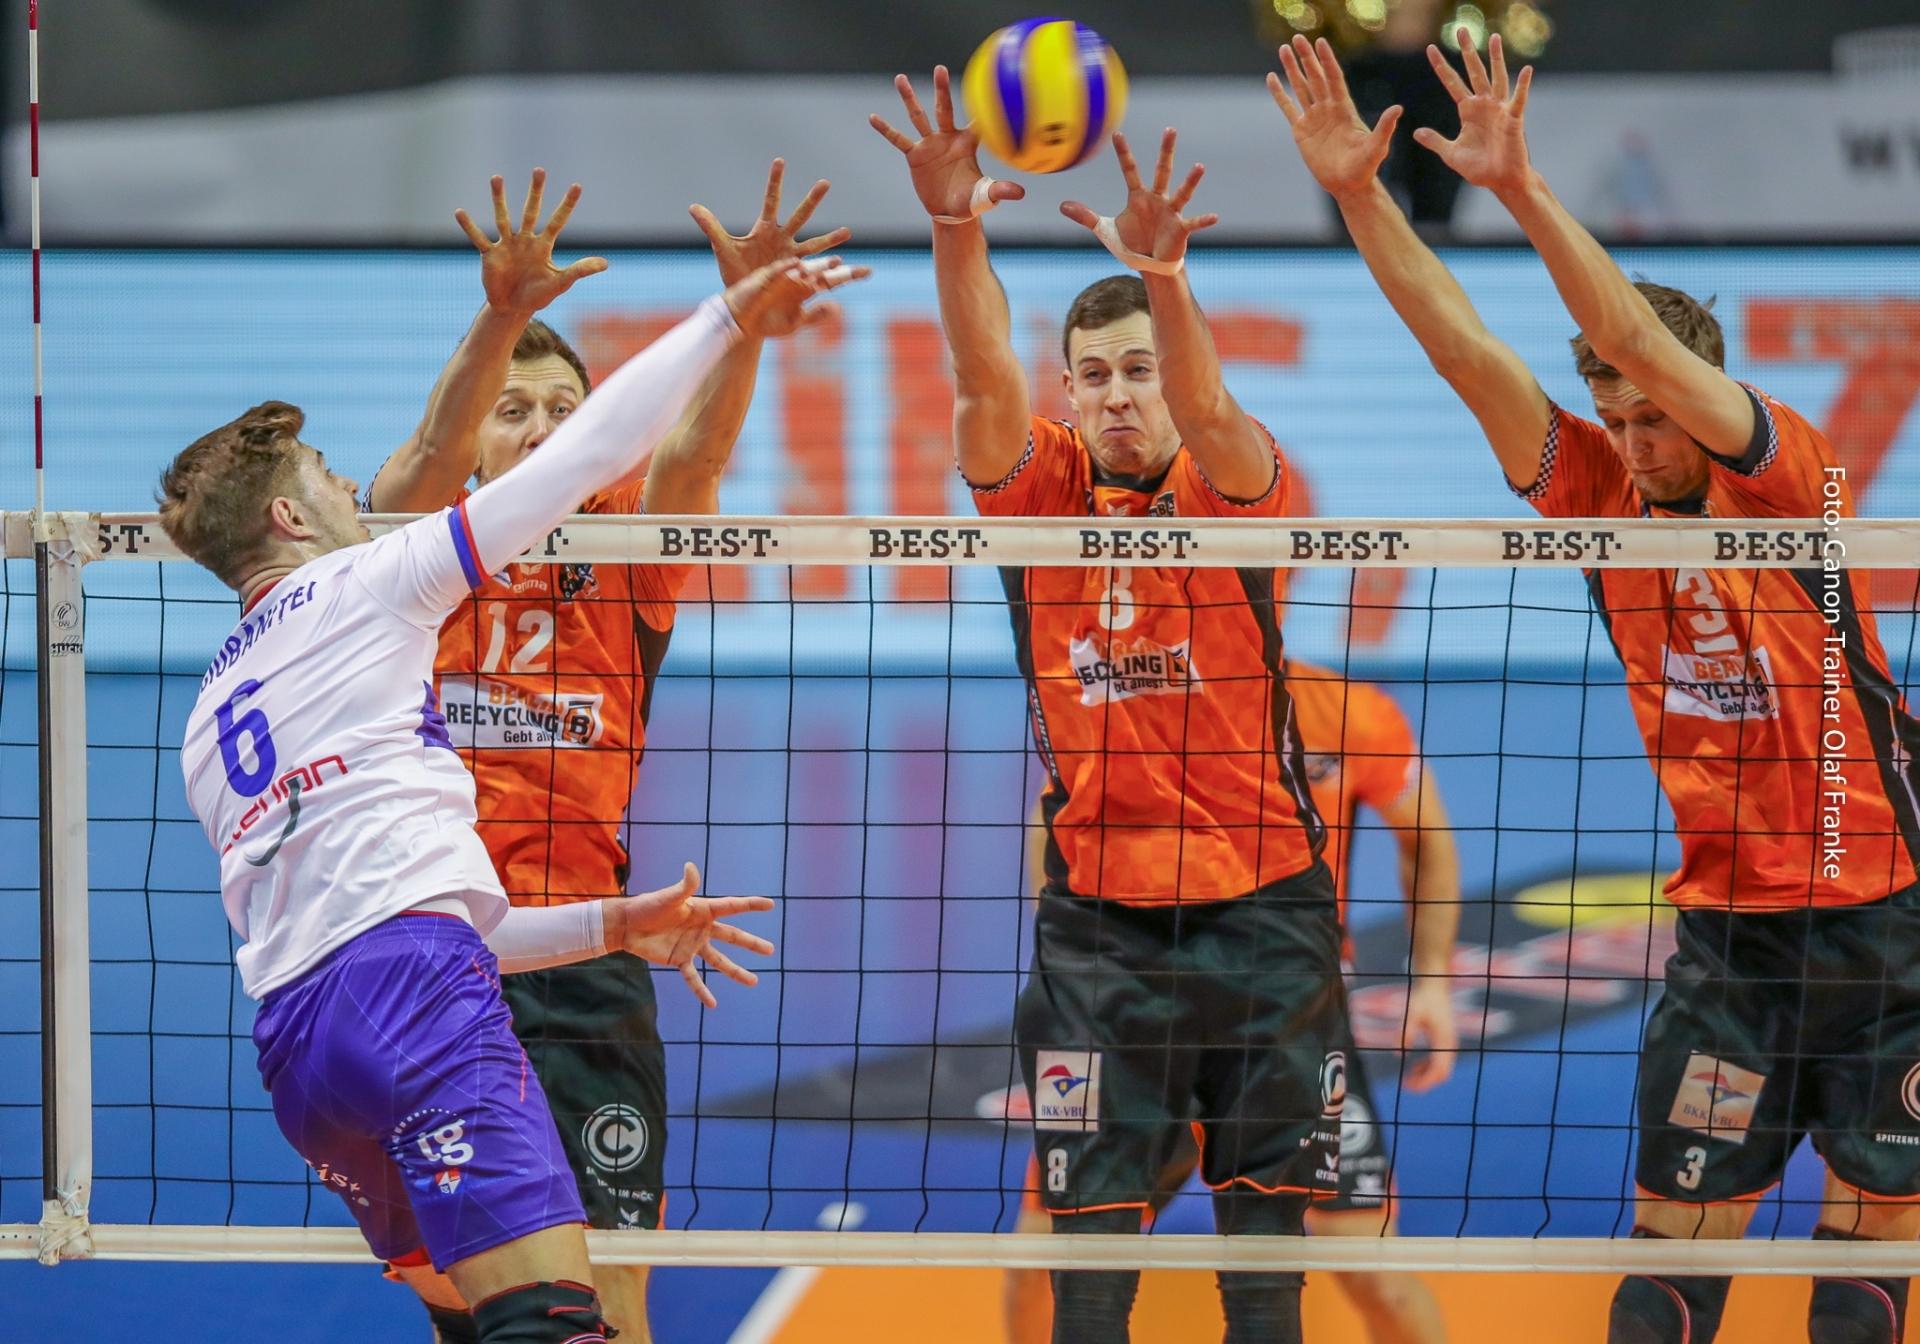 Volleyball Bundesliga bei den BR Volleys, inkl. online Bildbesprechung - Canon Academy Sport